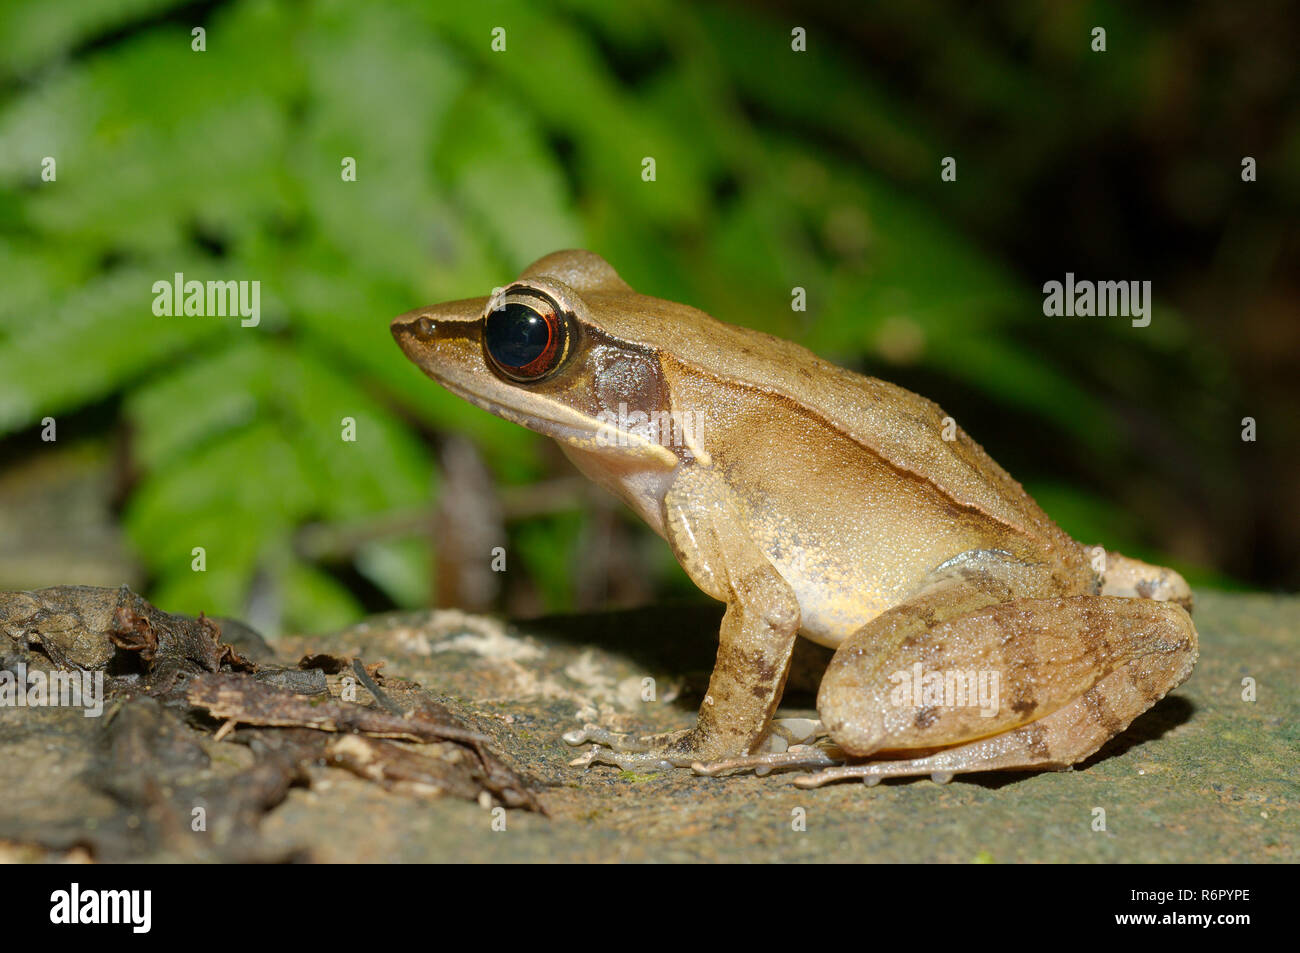 tropical frog (Hylarana Tschudi) sitting on the forest ground, Sinharaja Forest Reserve, national park, Sinharaja, Sri Lanka, South Asia - Stock Image